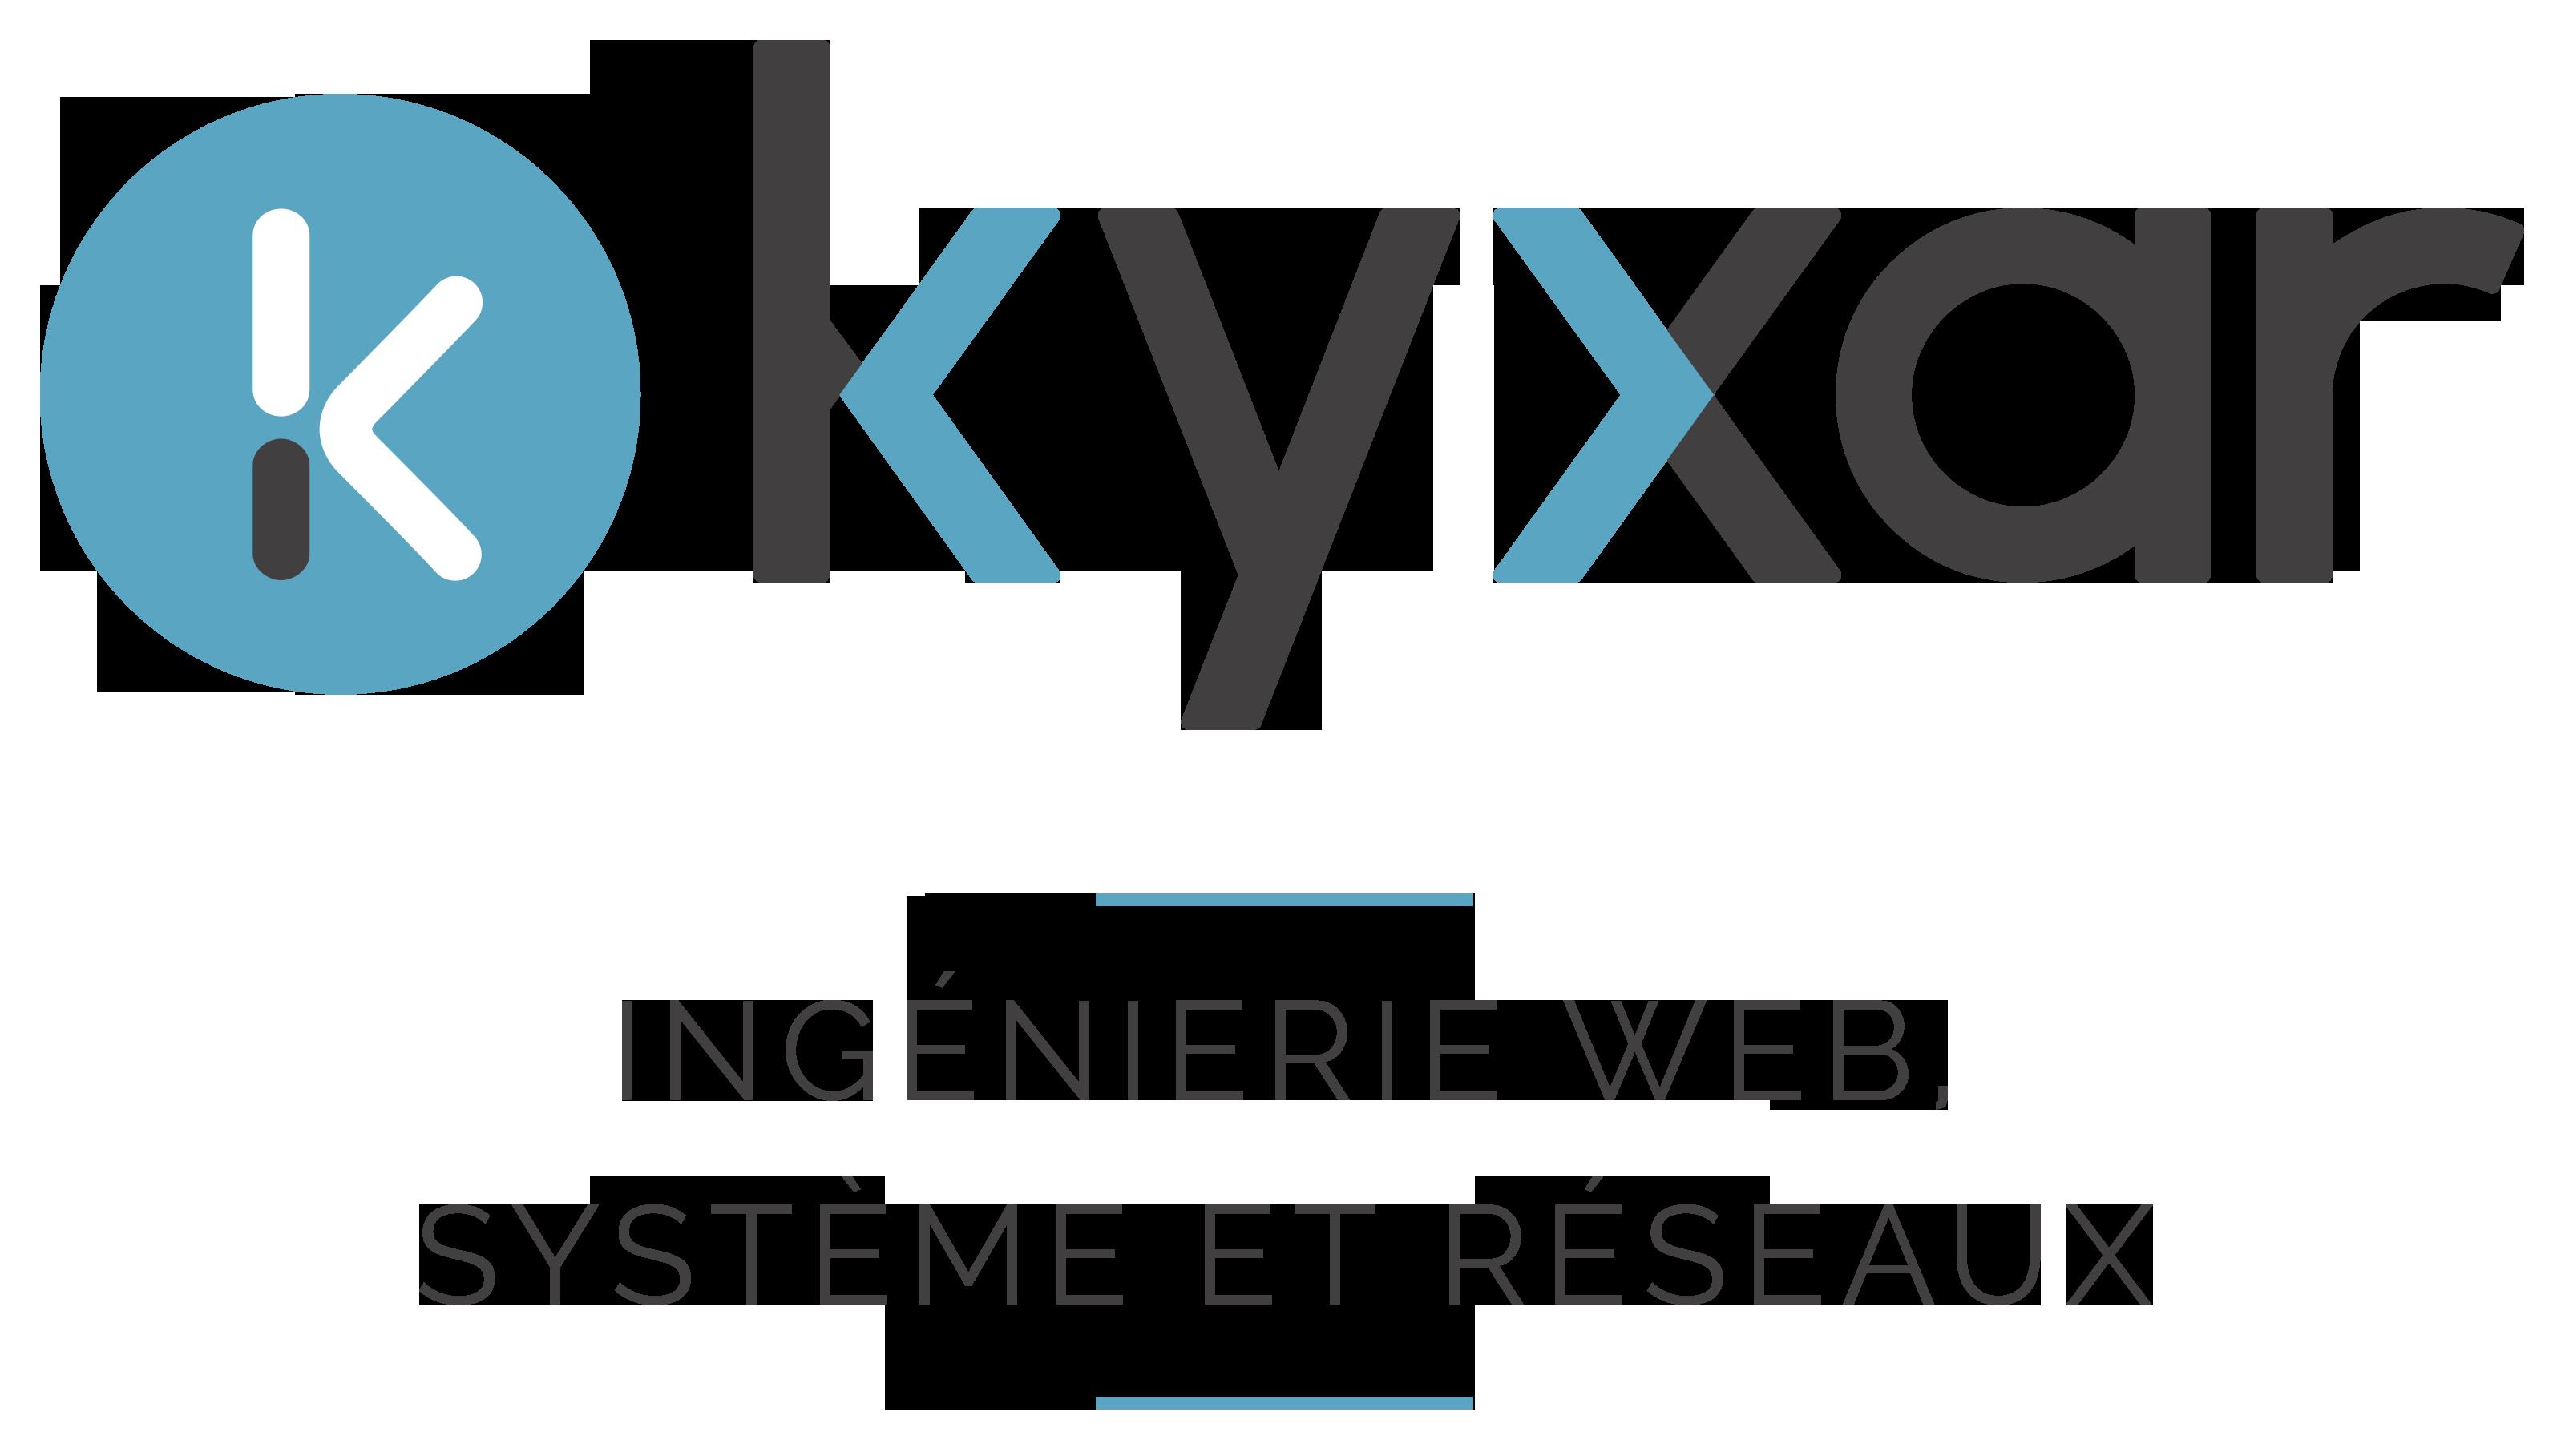 Logo de l'exposant : KYXAR